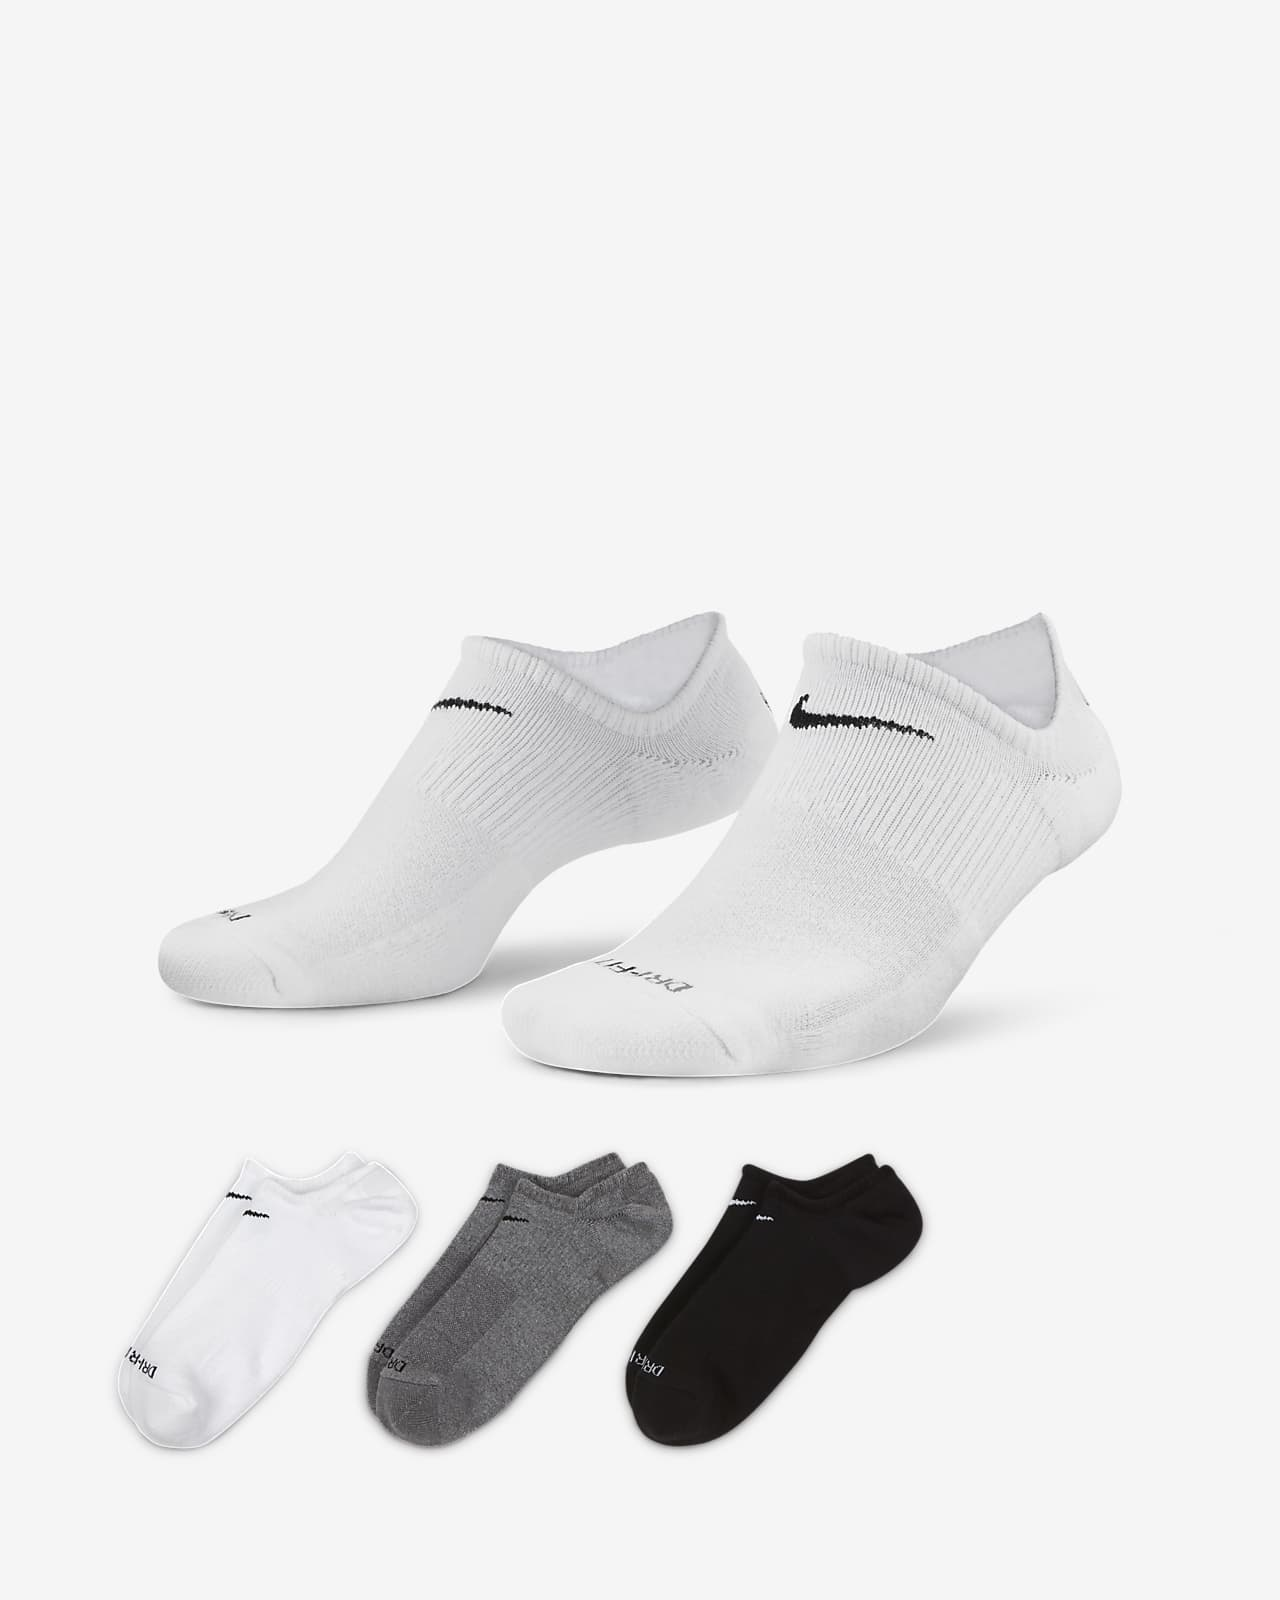 Calcetines invisibles de entrenamiento (3 pares) Nike Everyday Plus Cushioned